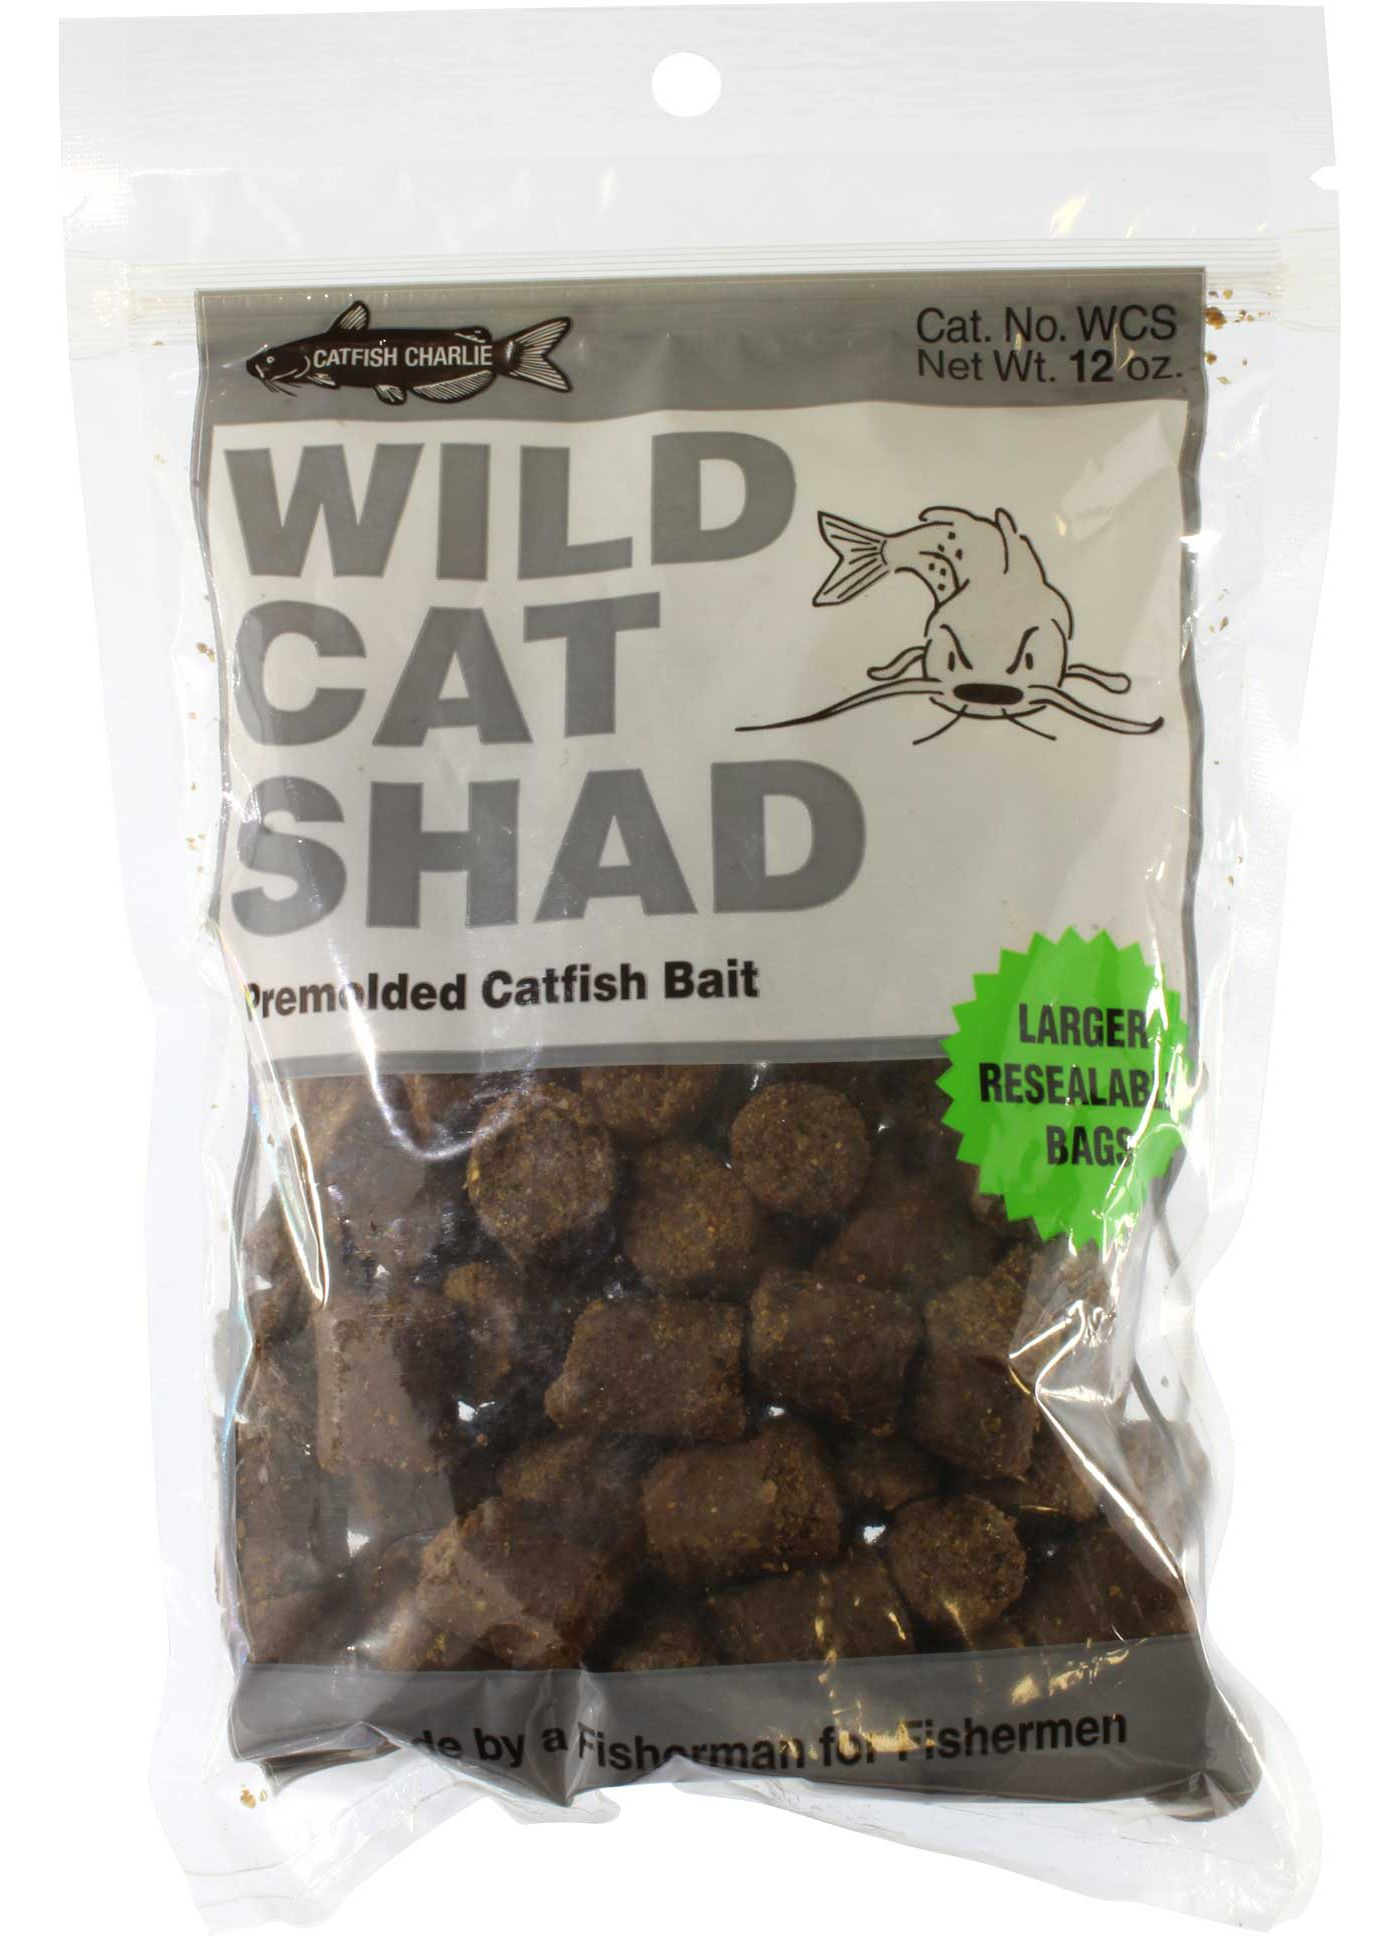 Catfish Charlie 12 oz. Wildcat Shad Dough Balls